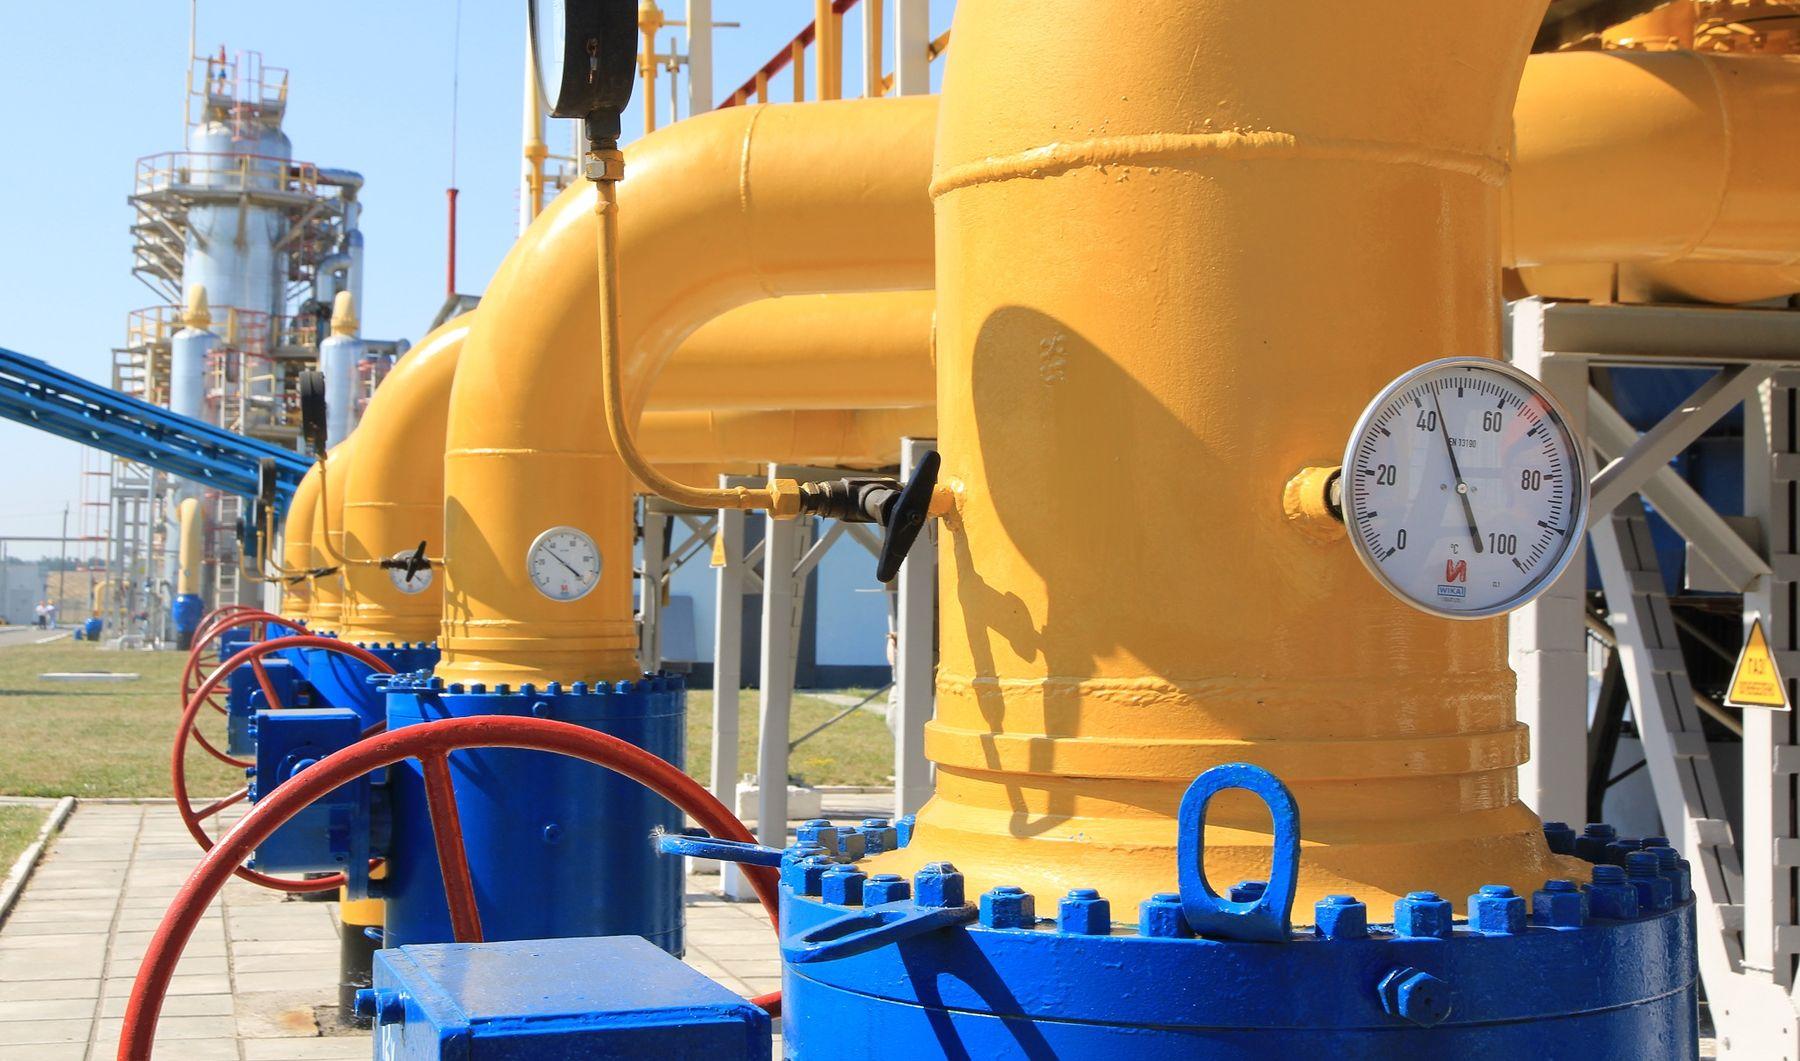 Нафтогаз: запасы газа – рекордные за 10 лет